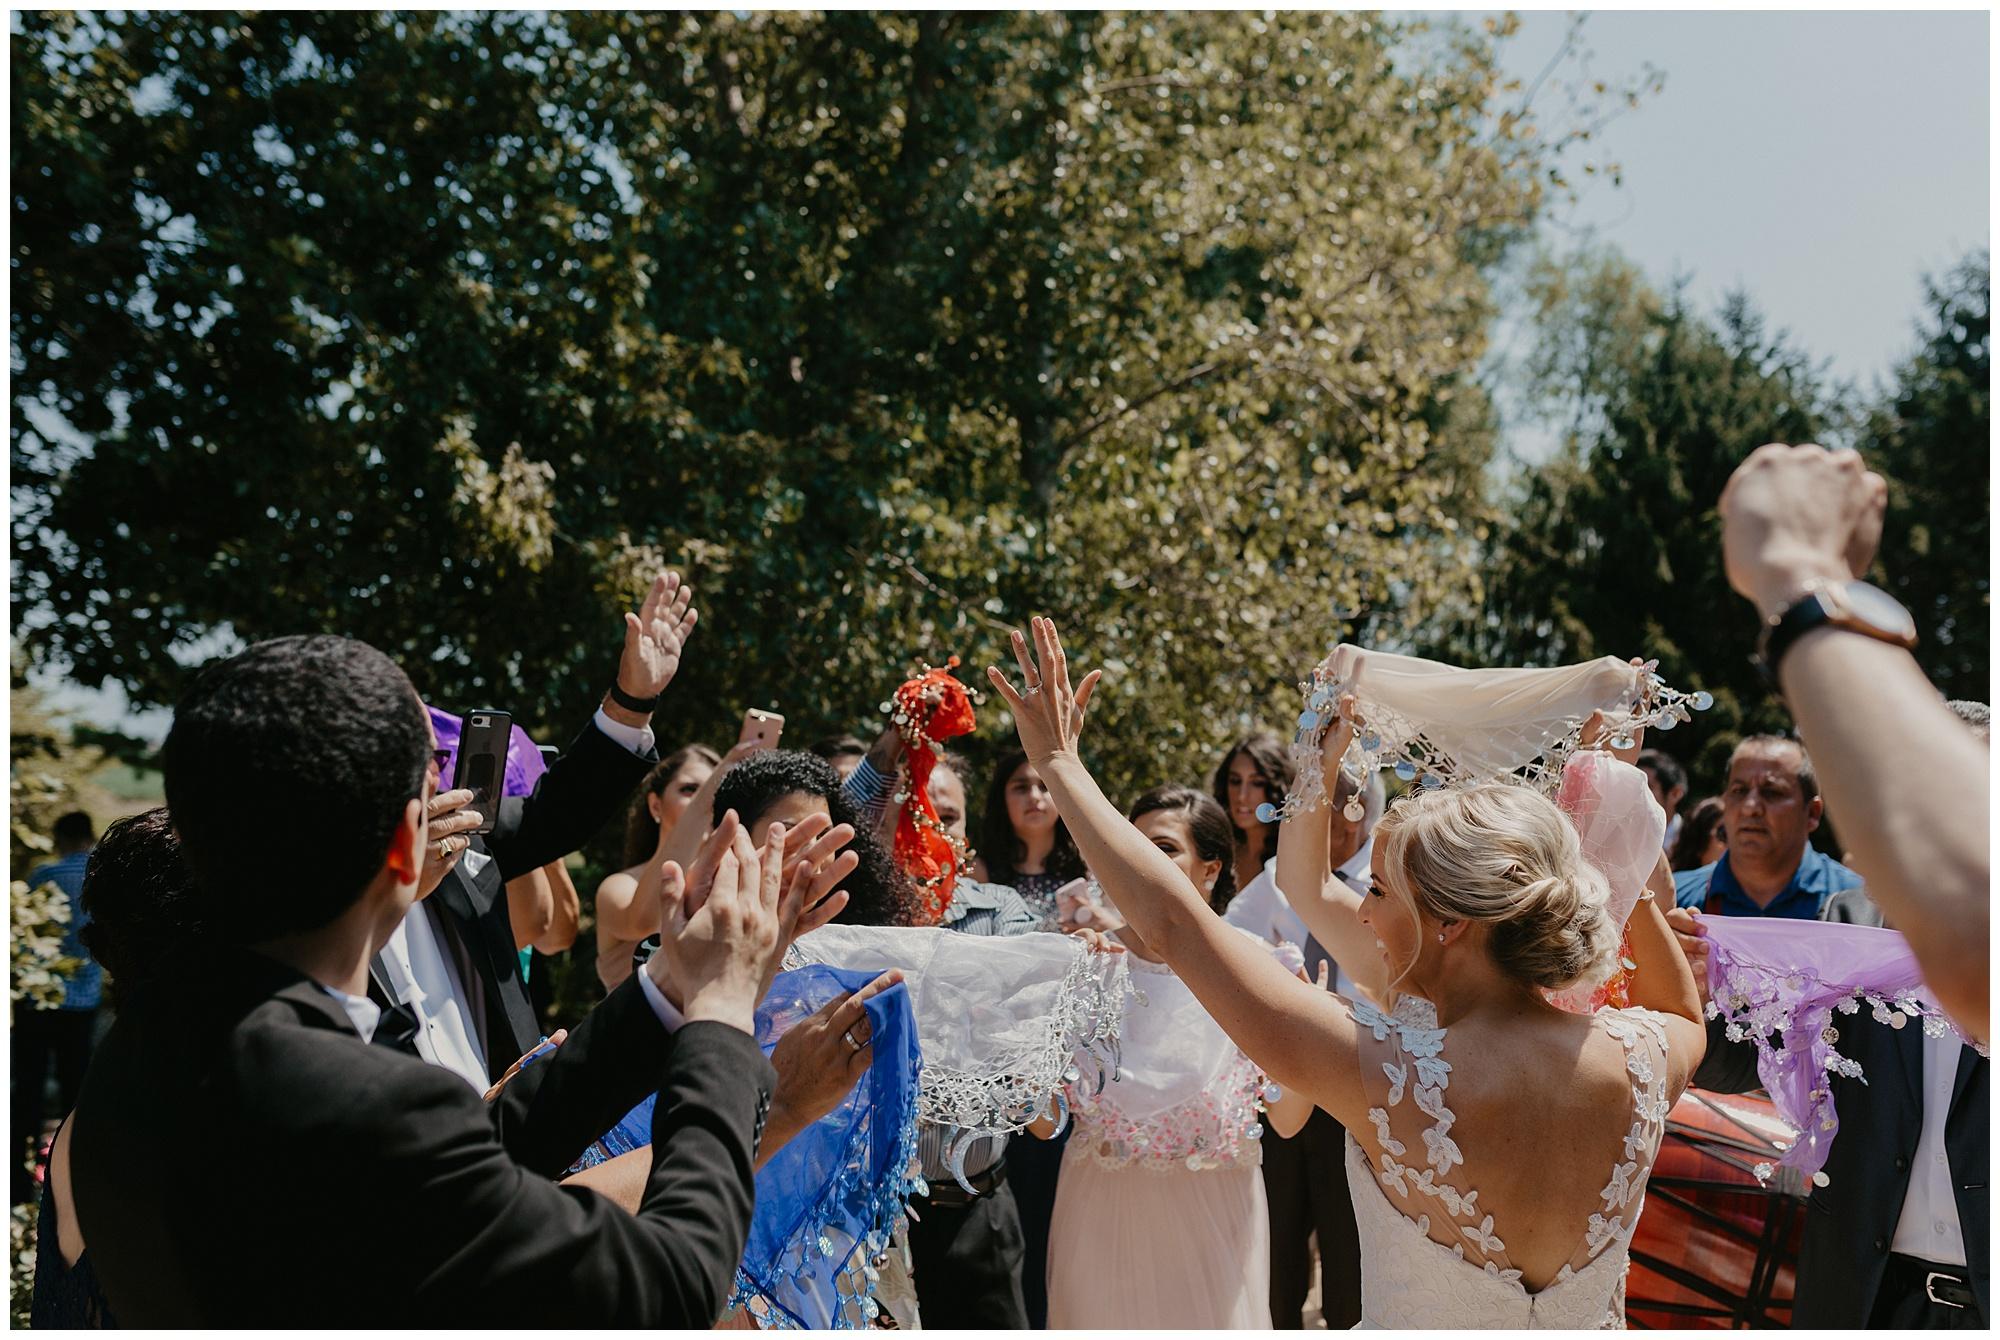 pear_tree_estate_wedding_champaign_il_wright_photographs_jj_0079.jpg